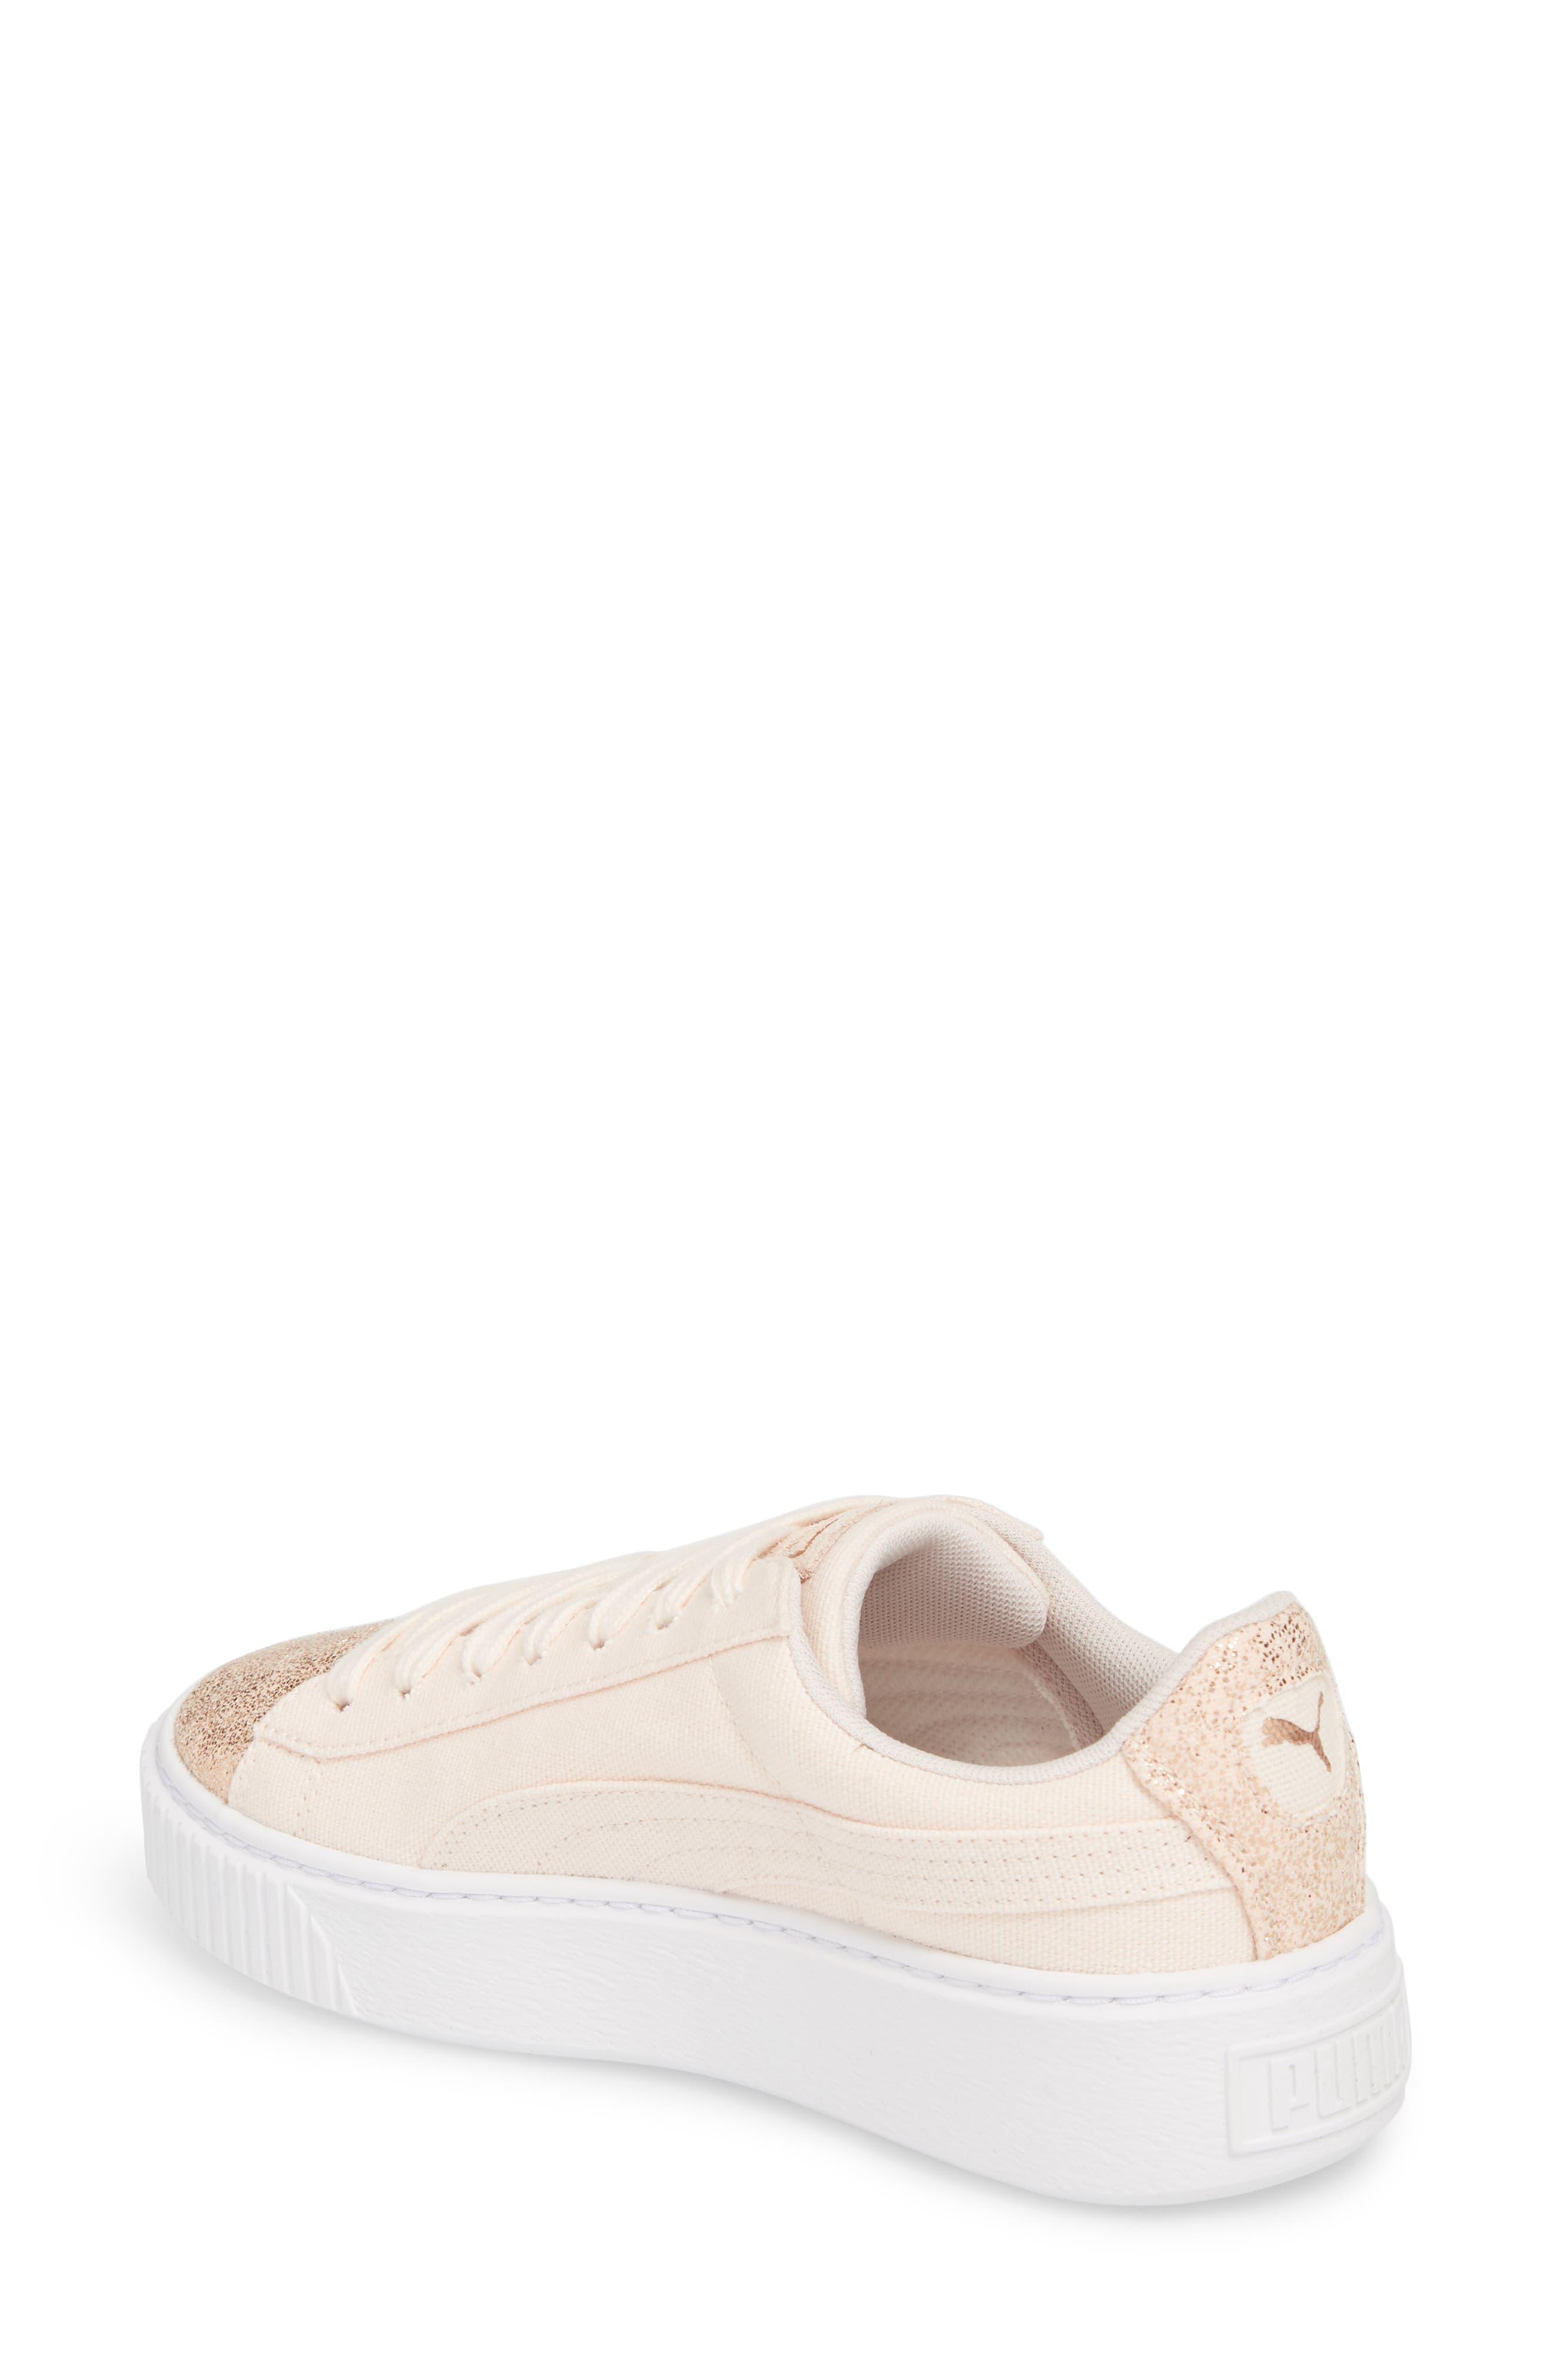 Basket Platform Sneaker,                             Alternate thumbnail 2, color,                             Pearl/ Rose Gold